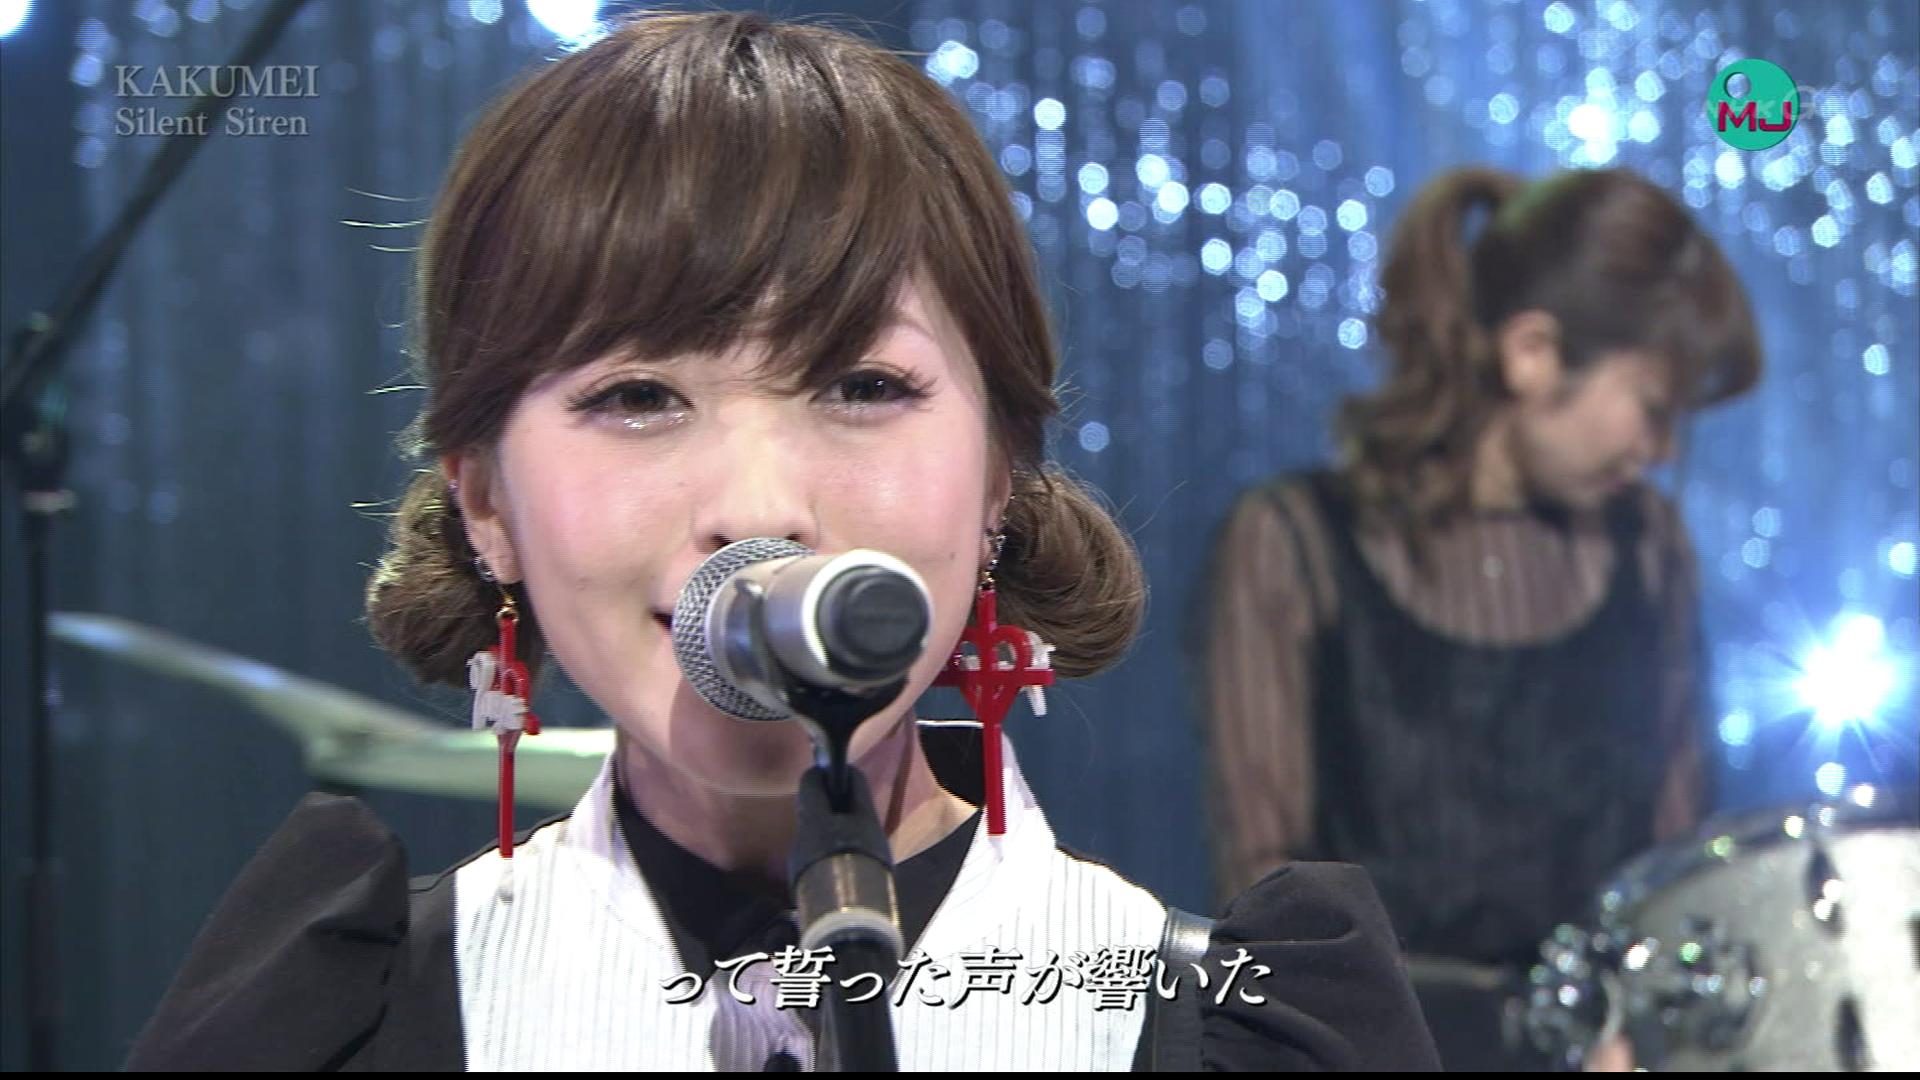 20160809.04.23 Silent Siren - Kakumei (Music Japan 2015.02.22 HDTV) (JPOP.ru).ts 1.jpg